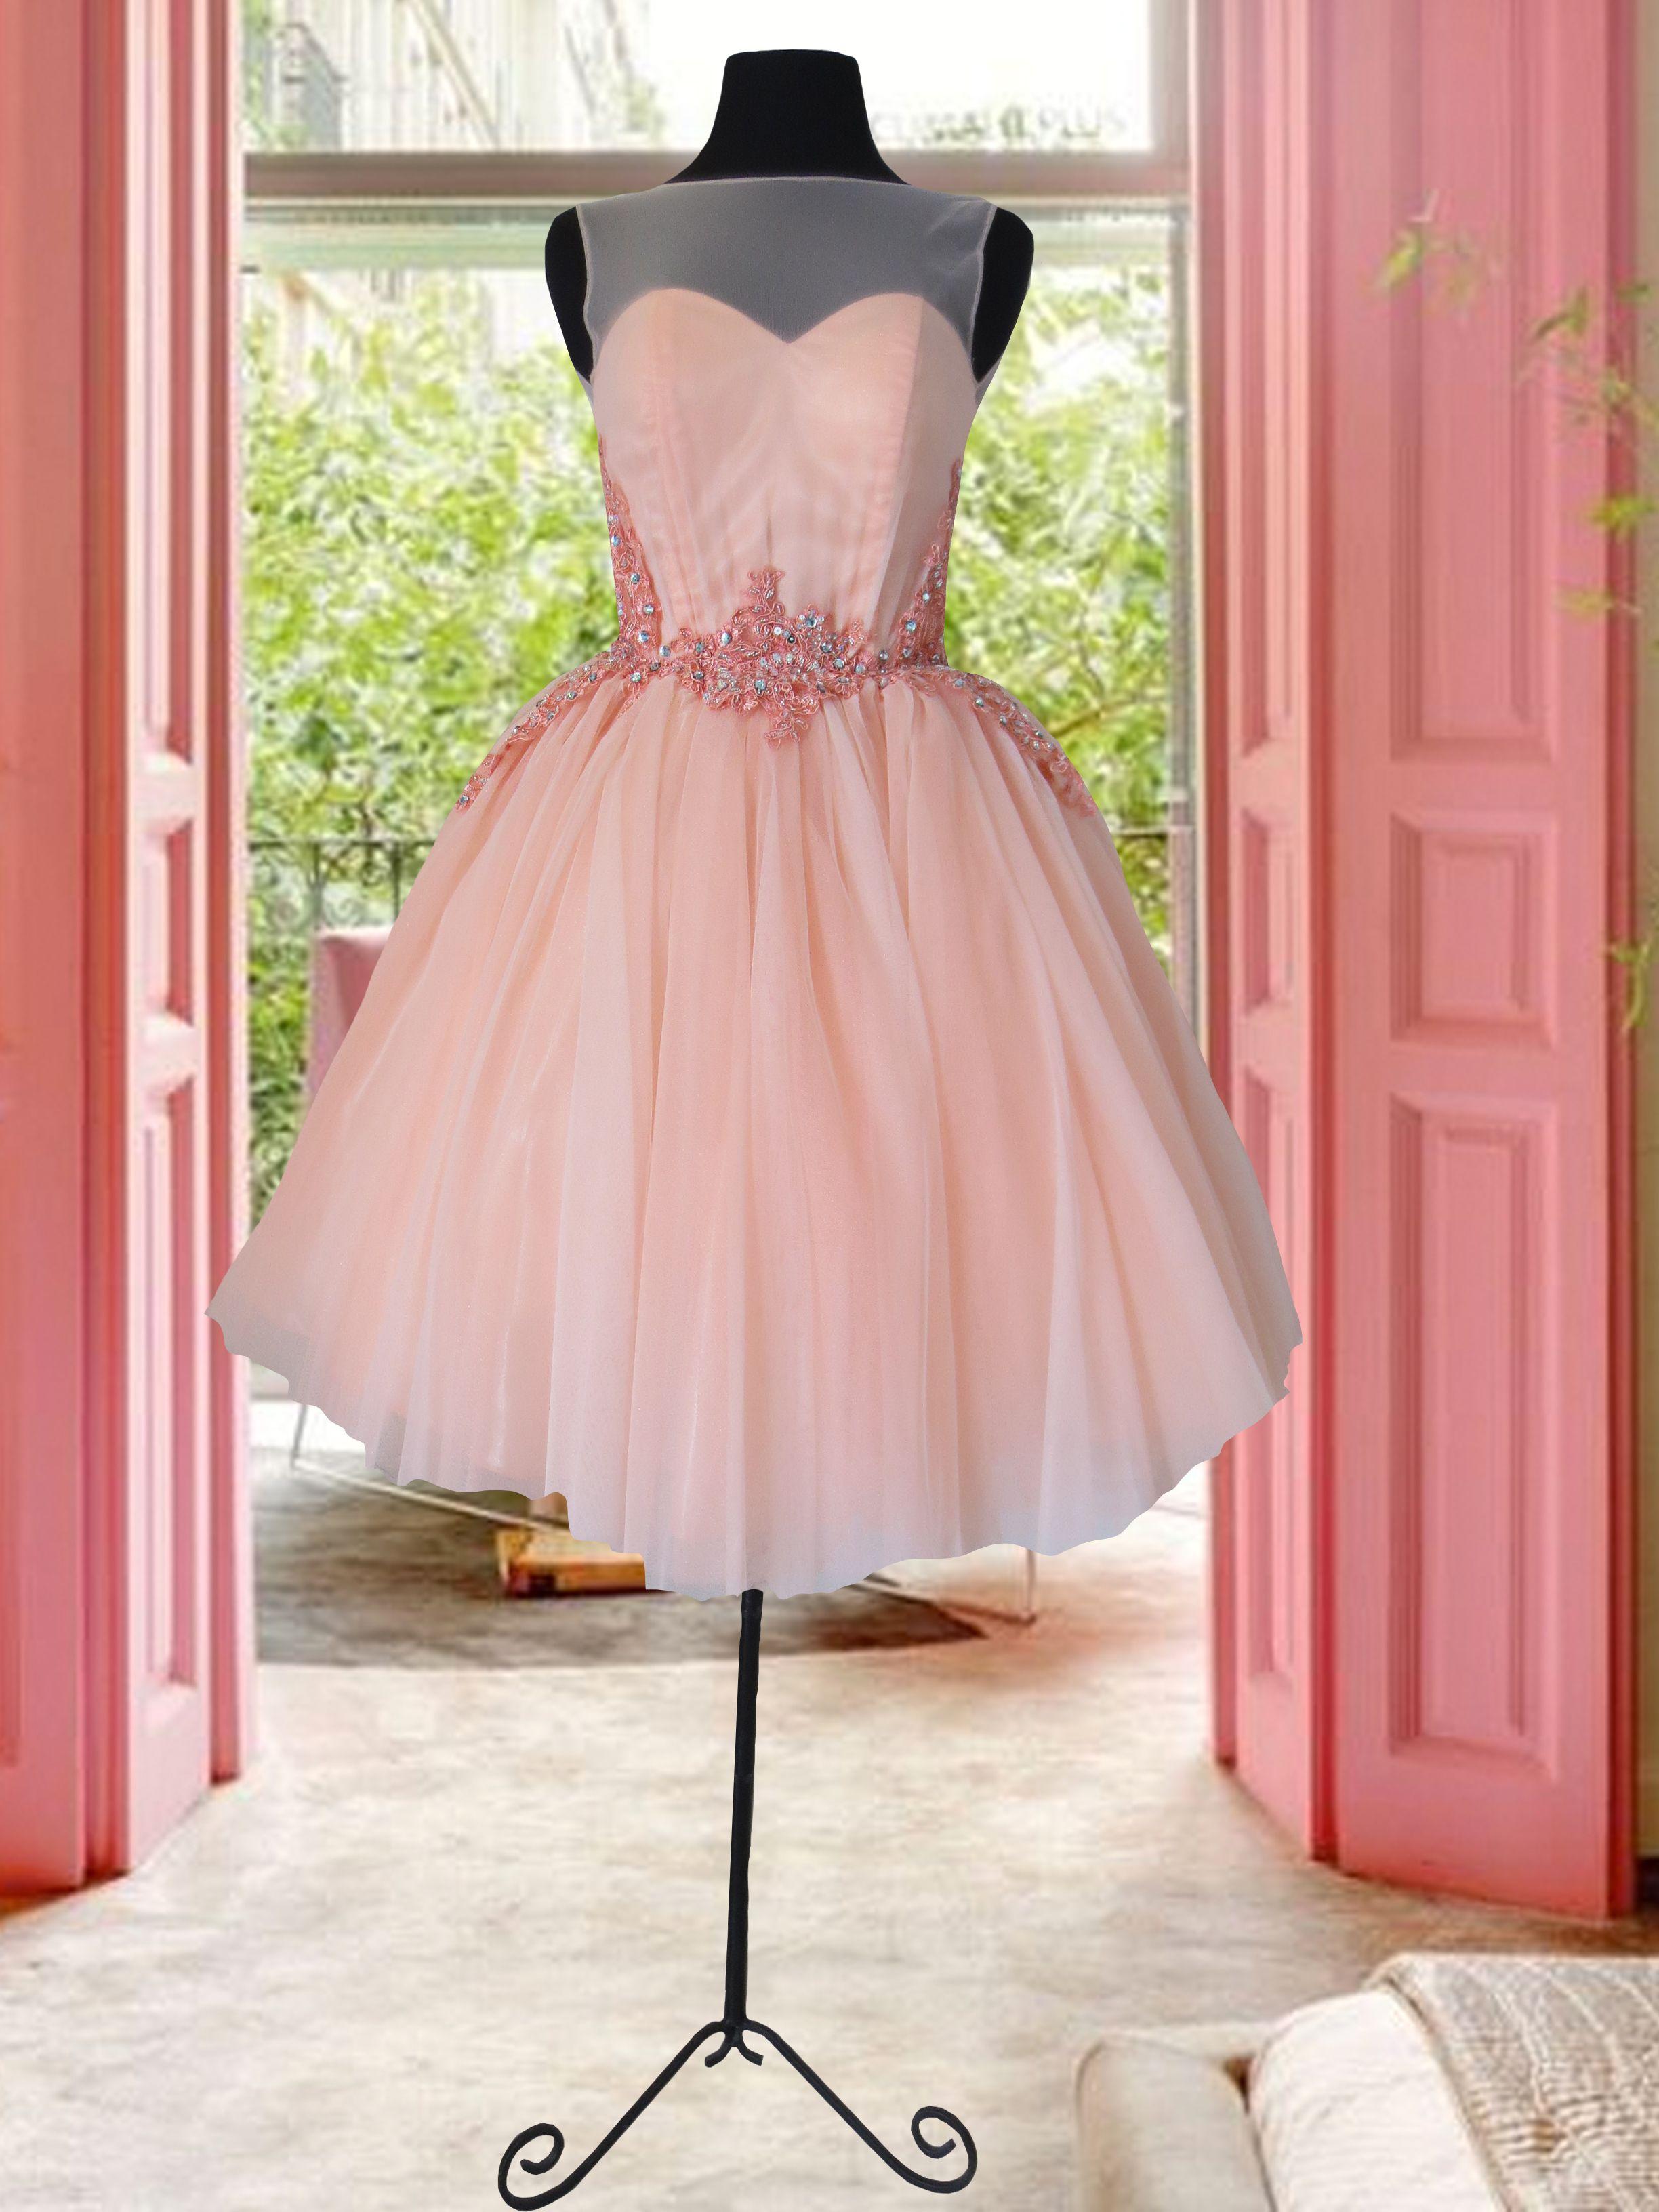 Vistoso Víspera De Vestidos De Novia Milady Composición - Ideas de ...